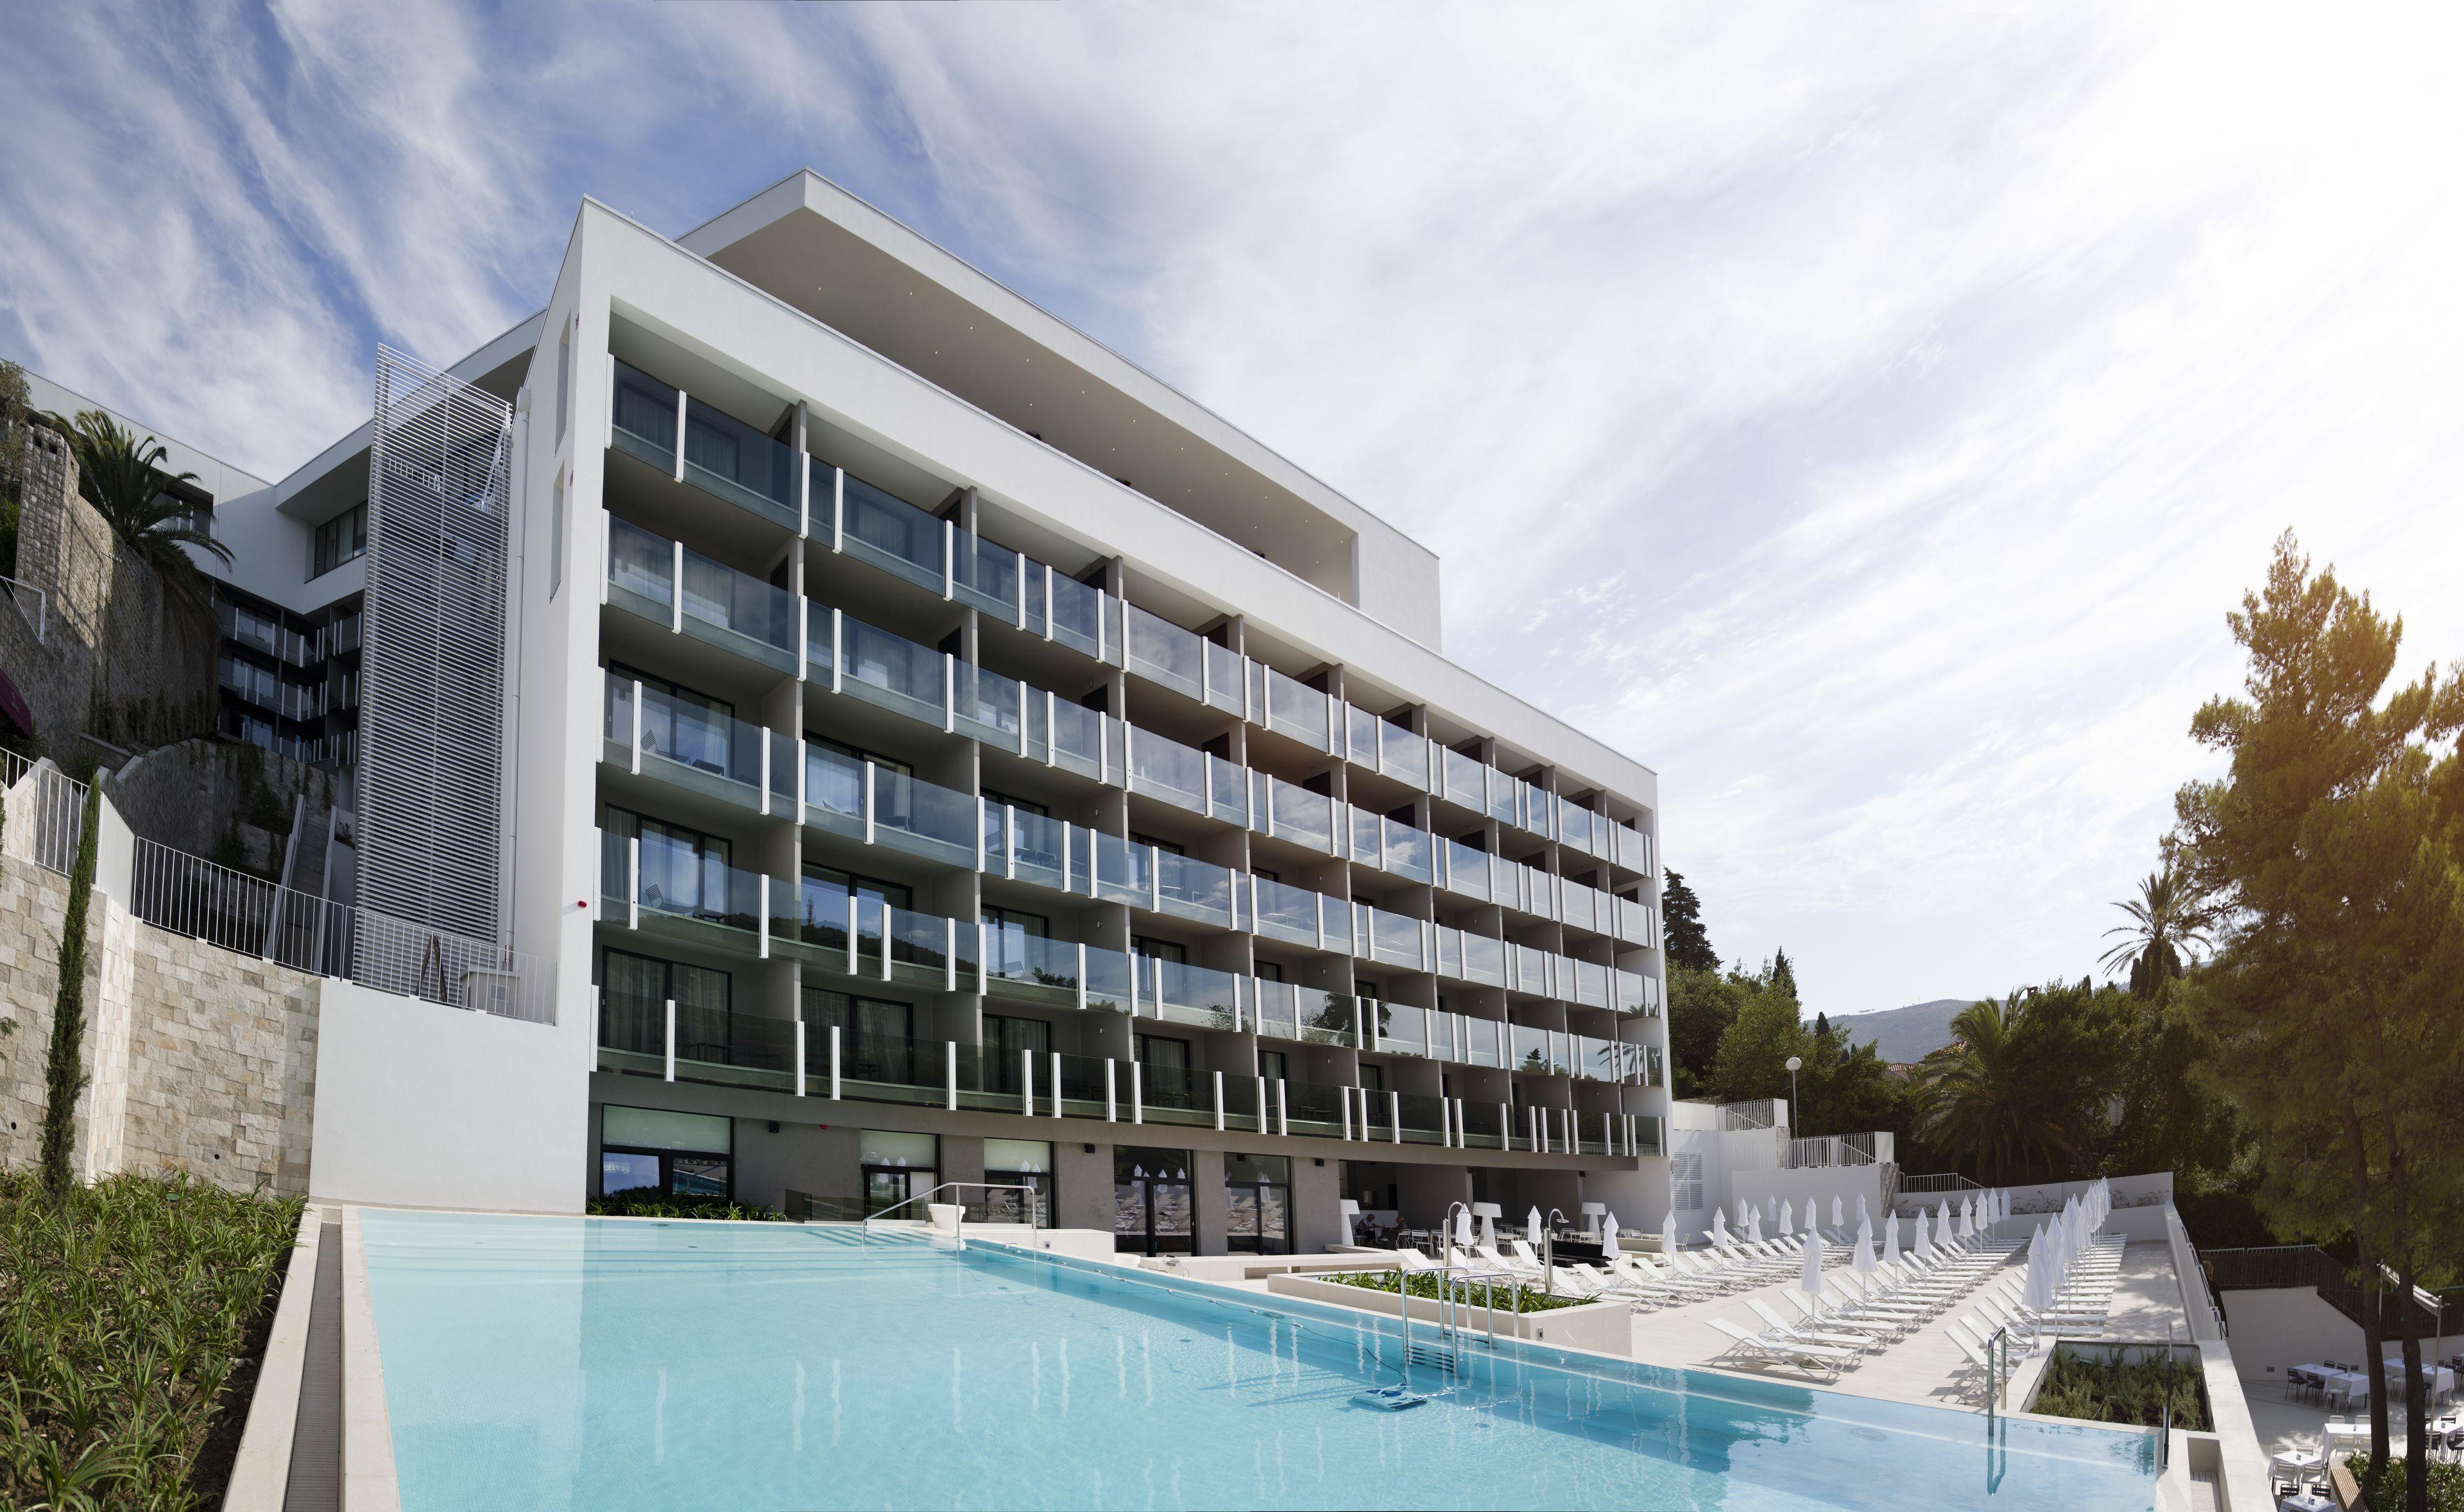 Courtesy of Hotel Kompas Dubrovnik / Expedia